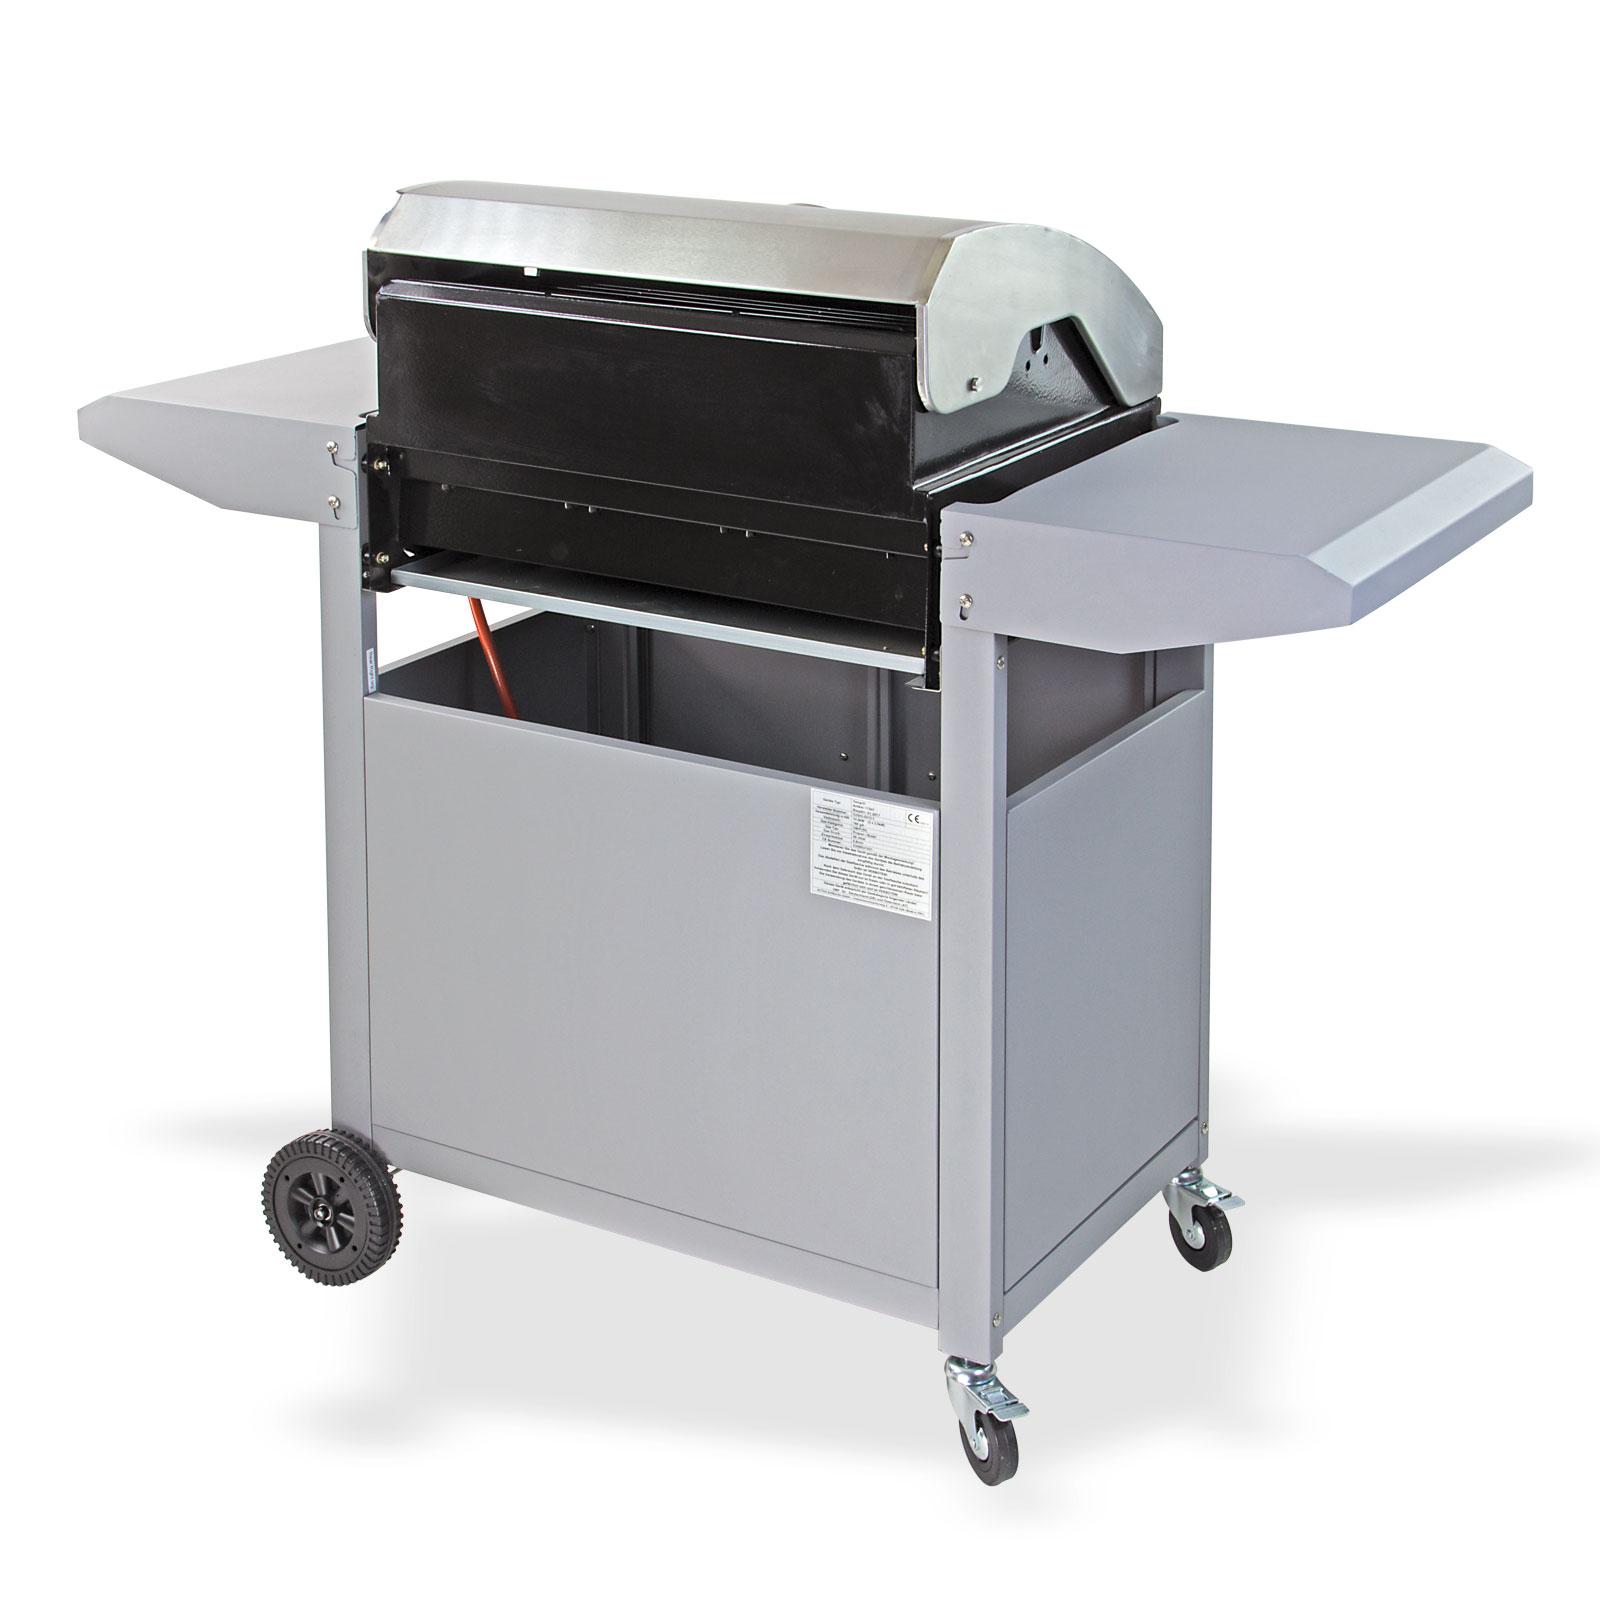 edelstahl gas grill gasgrill bbq barbecue smoker grillwagen grillen neu 17541 ebay. Black Bedroom Furniture Sets. Home Design Ideas